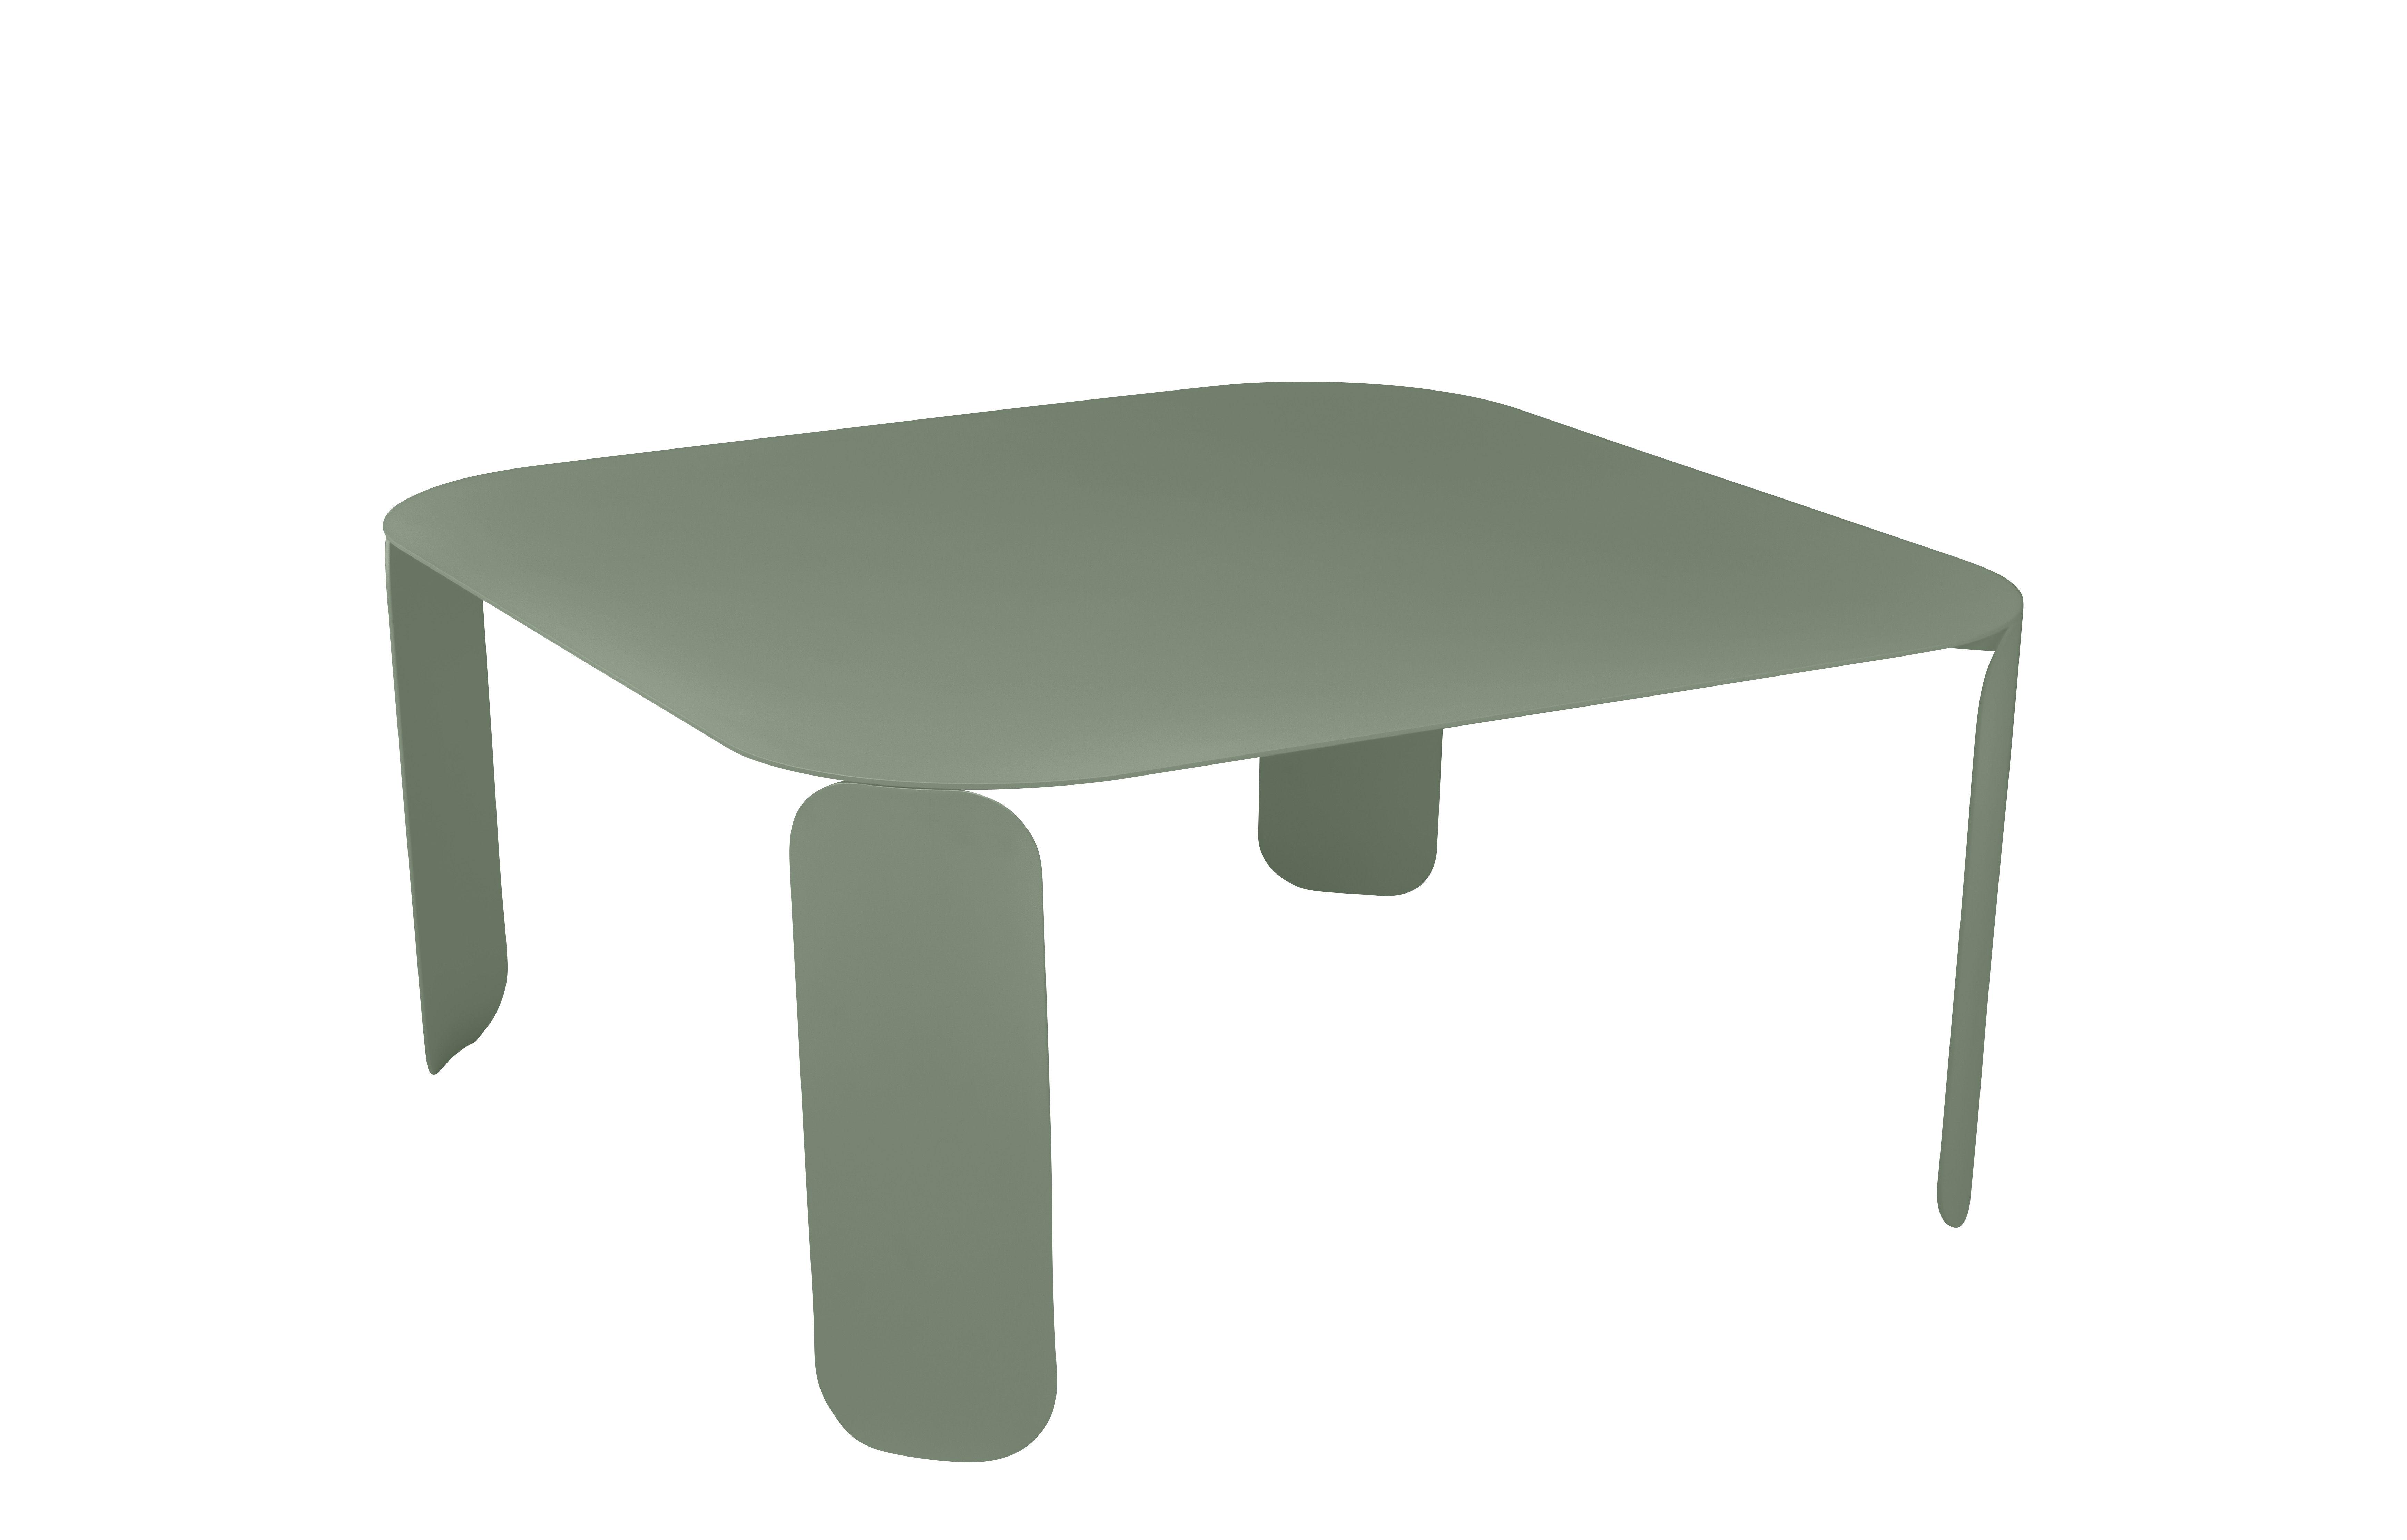 Arredamento - Tavolini  - Tavolino Bebop - / L 90 x H 42 cm di Fermob - Cactus - Acciaio, Alluminio